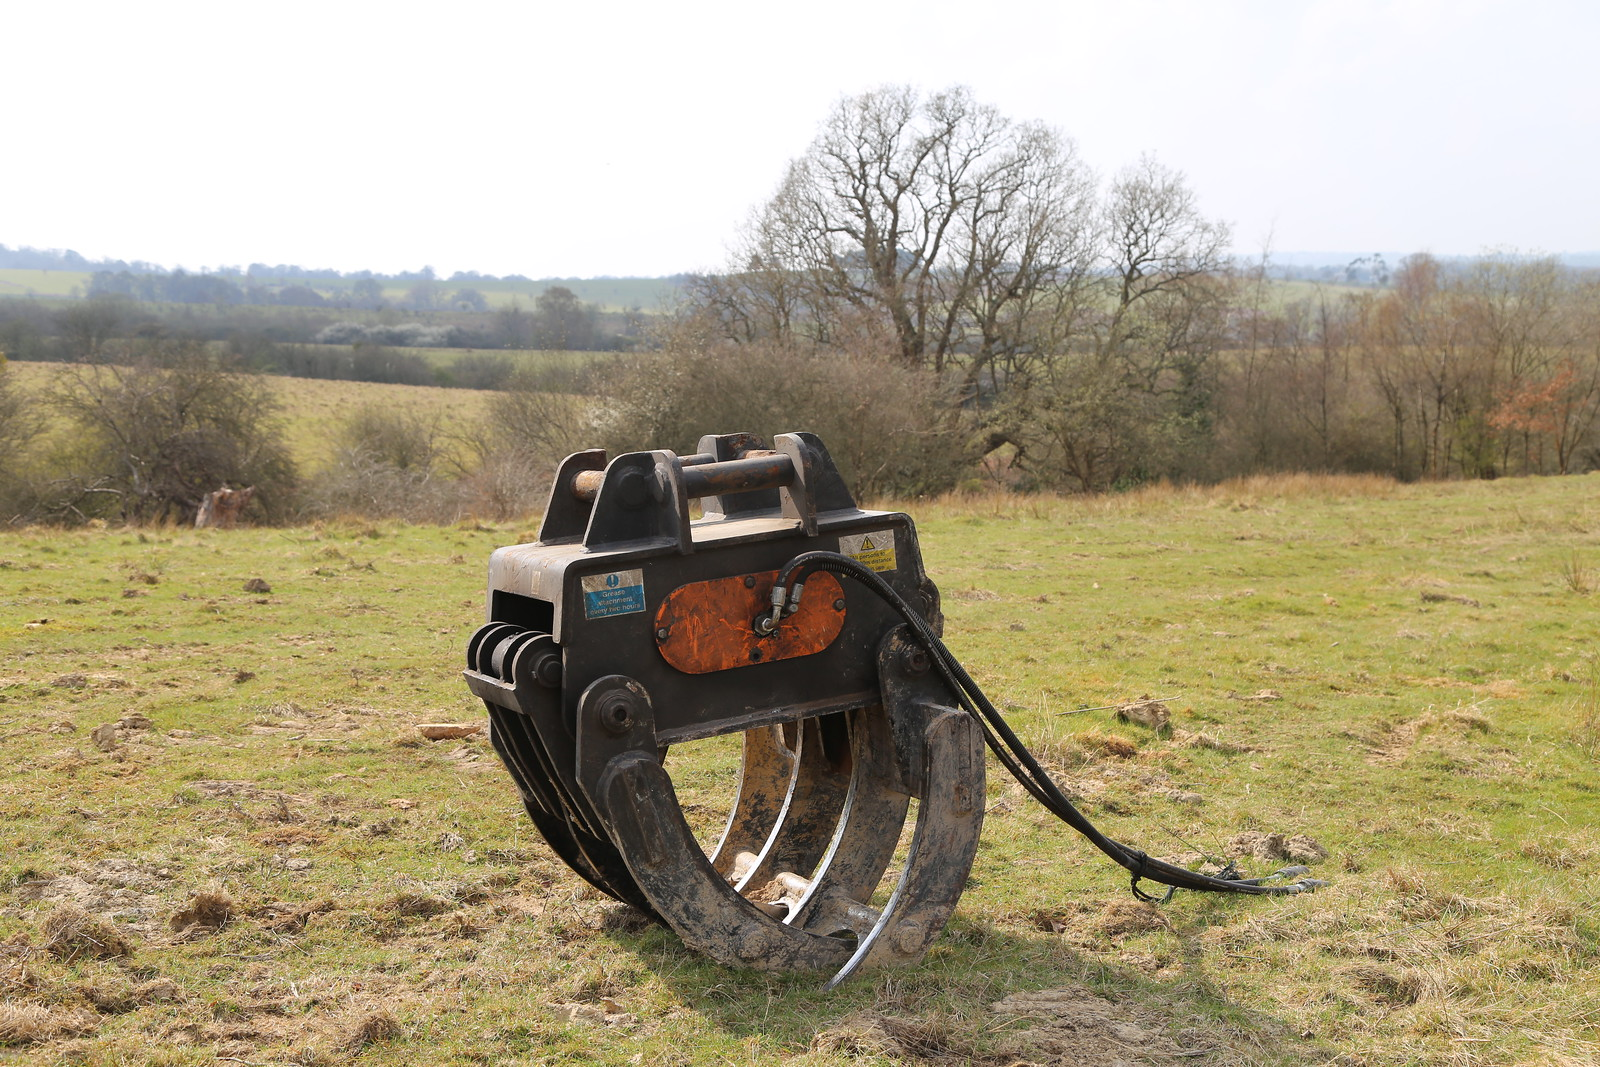 Machinery in the landscape near Eridge